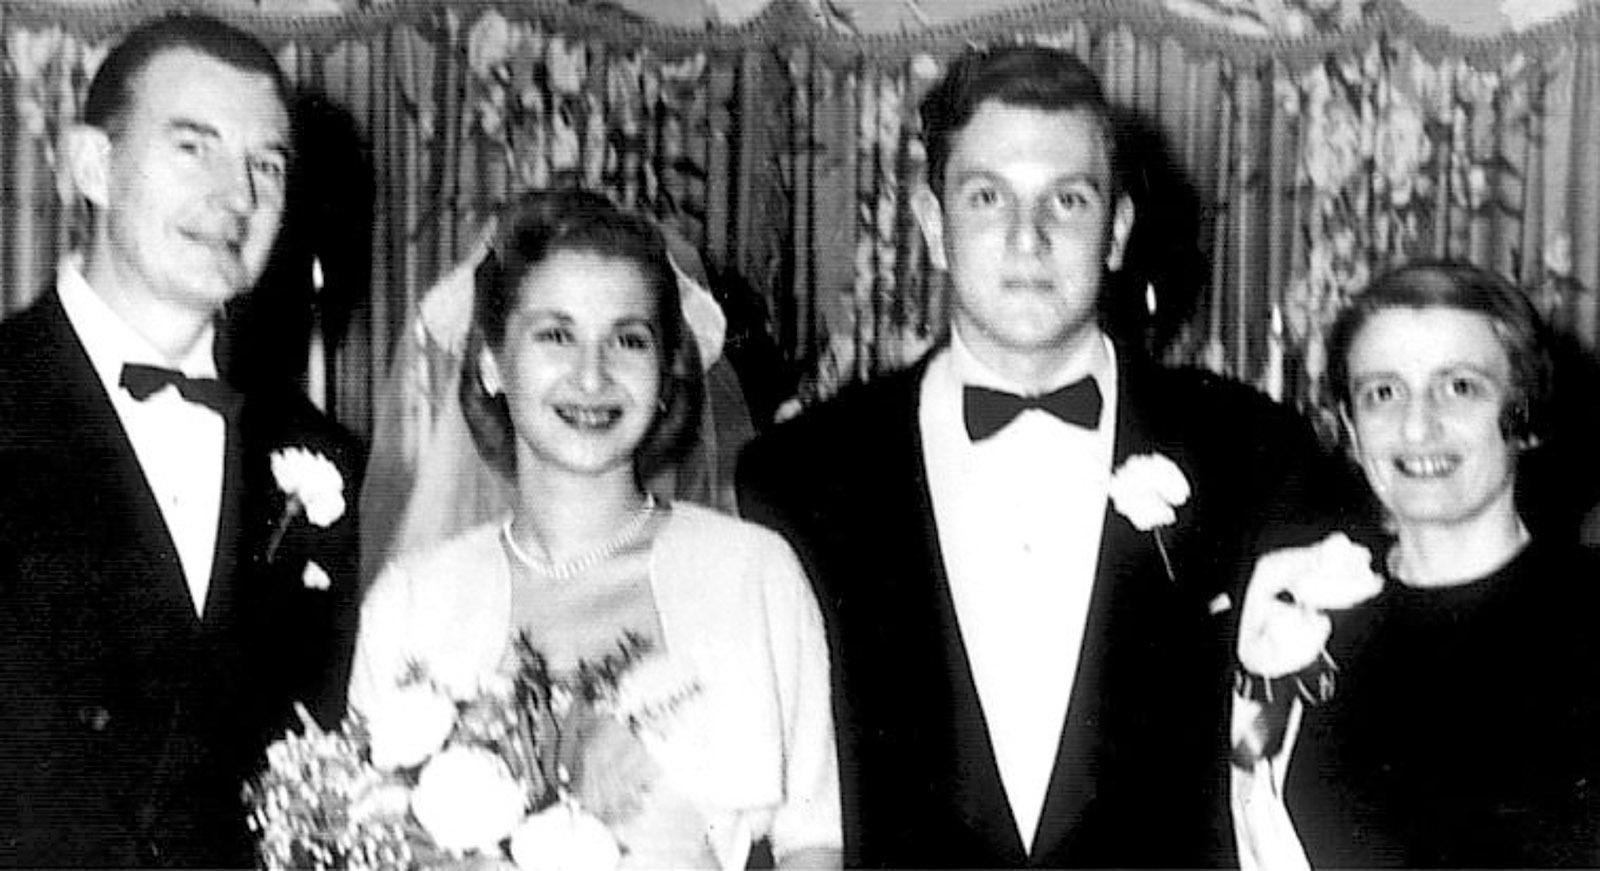 Frank O'Connor, Barbara Branden, Nathaniel Branden, and Ayn Rand